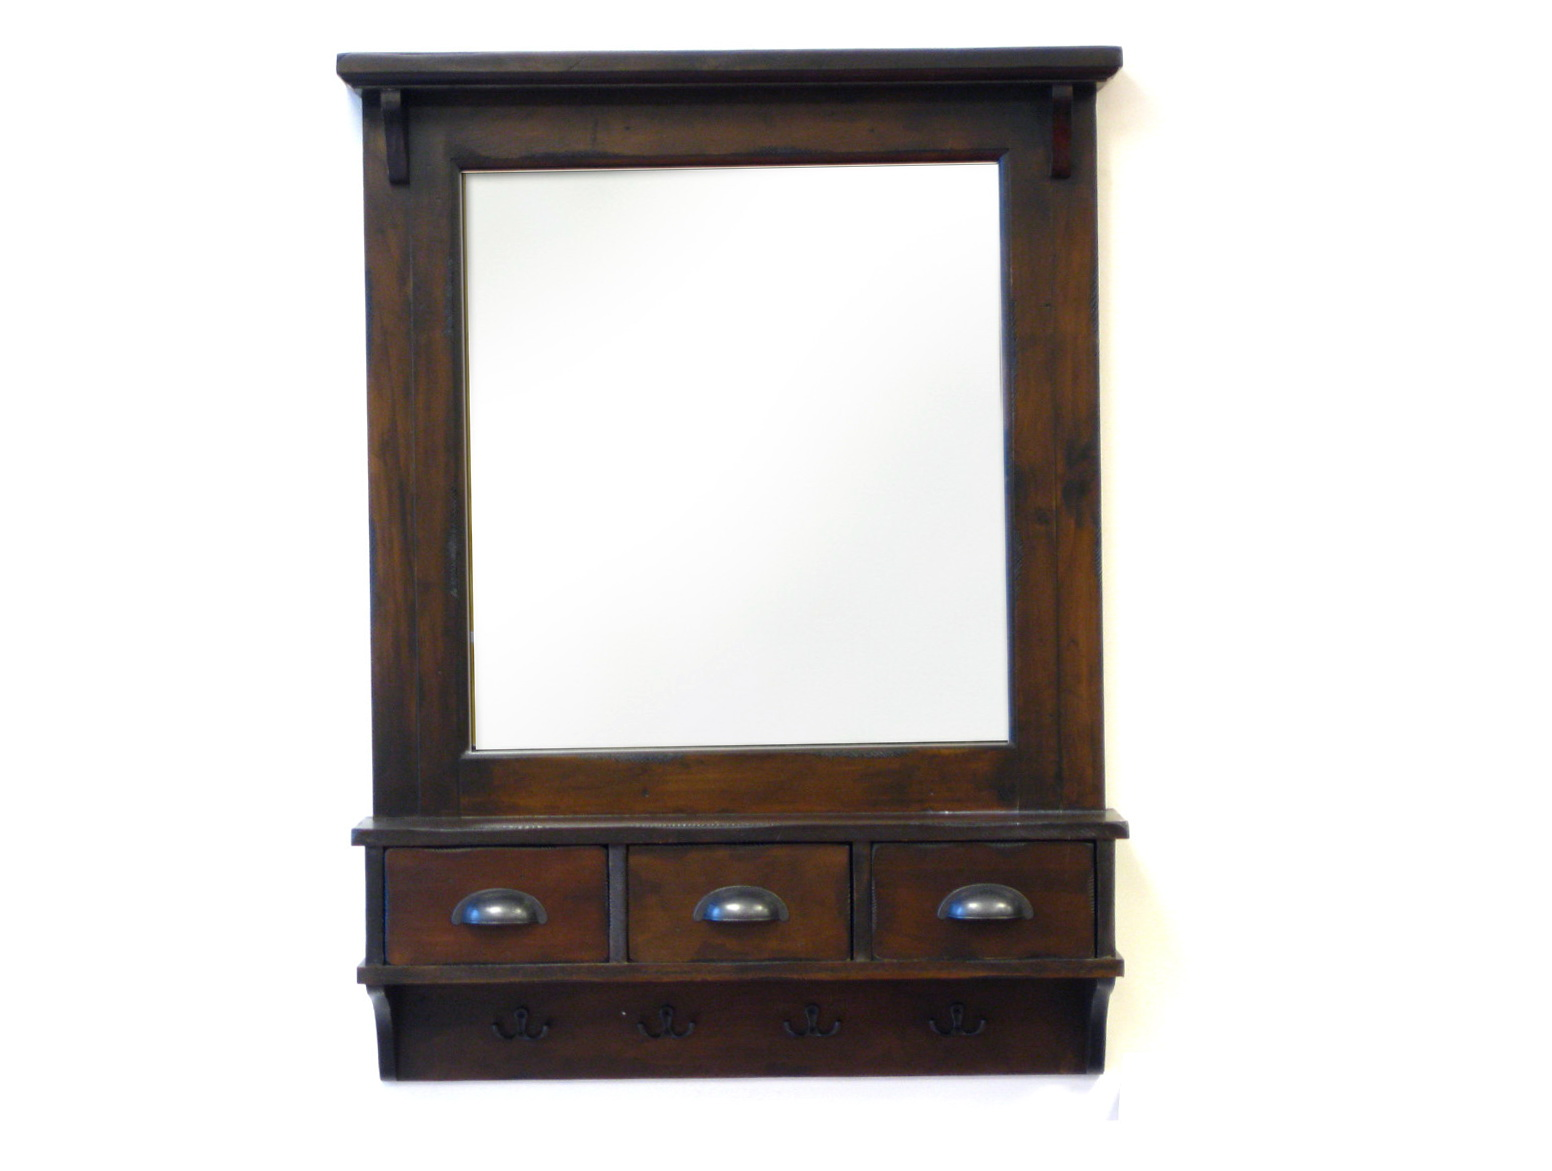 Wooden bathroom mirror with shelf home design ideas for Wooden bathroom mirror with shelf